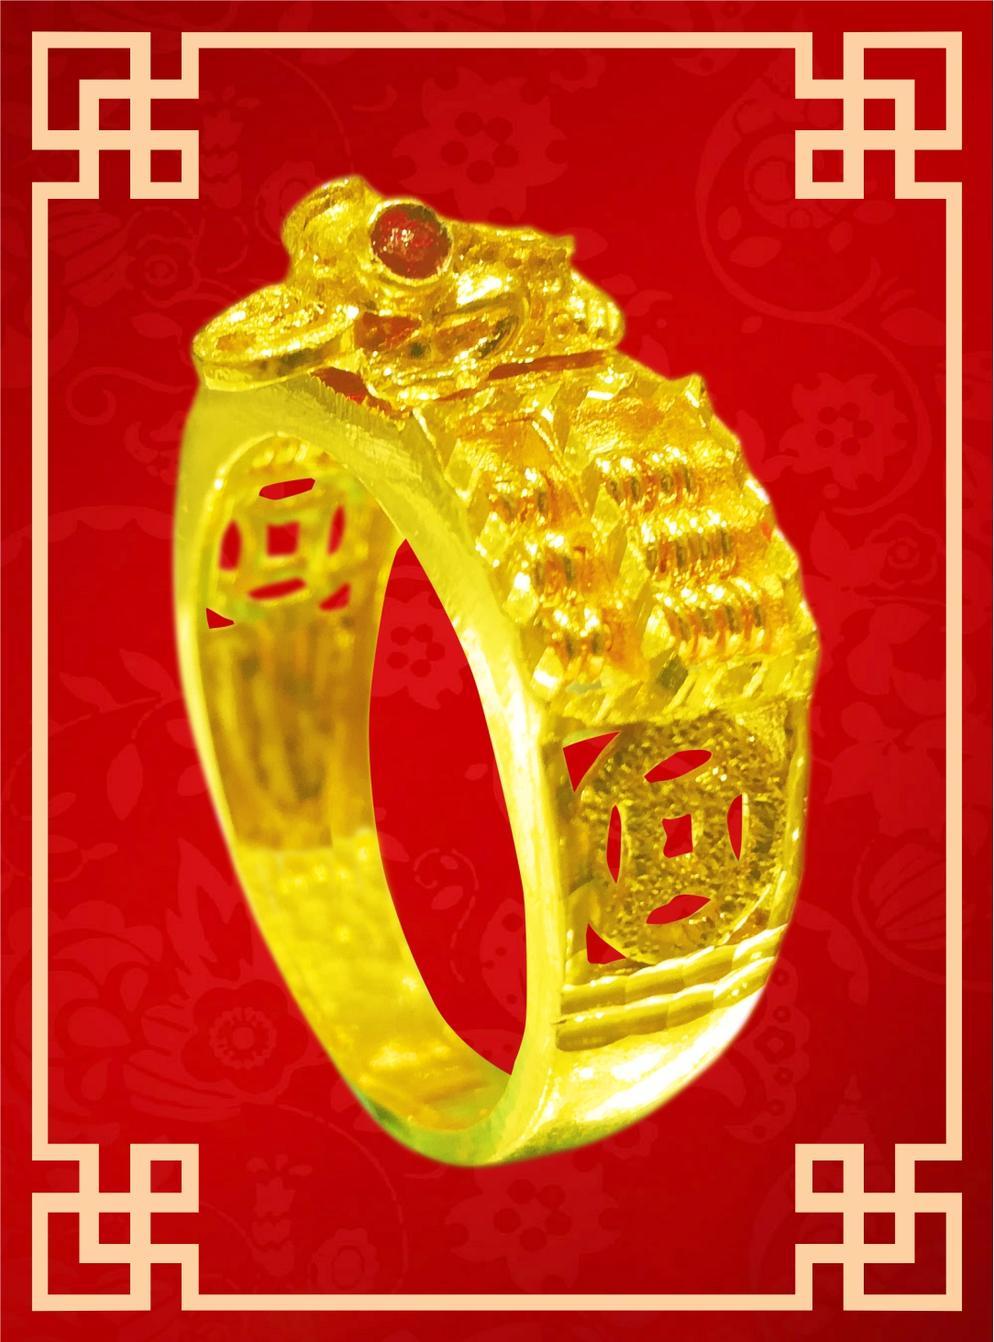 MONEY FROG RING 916 Gold LoveEternally Jewels